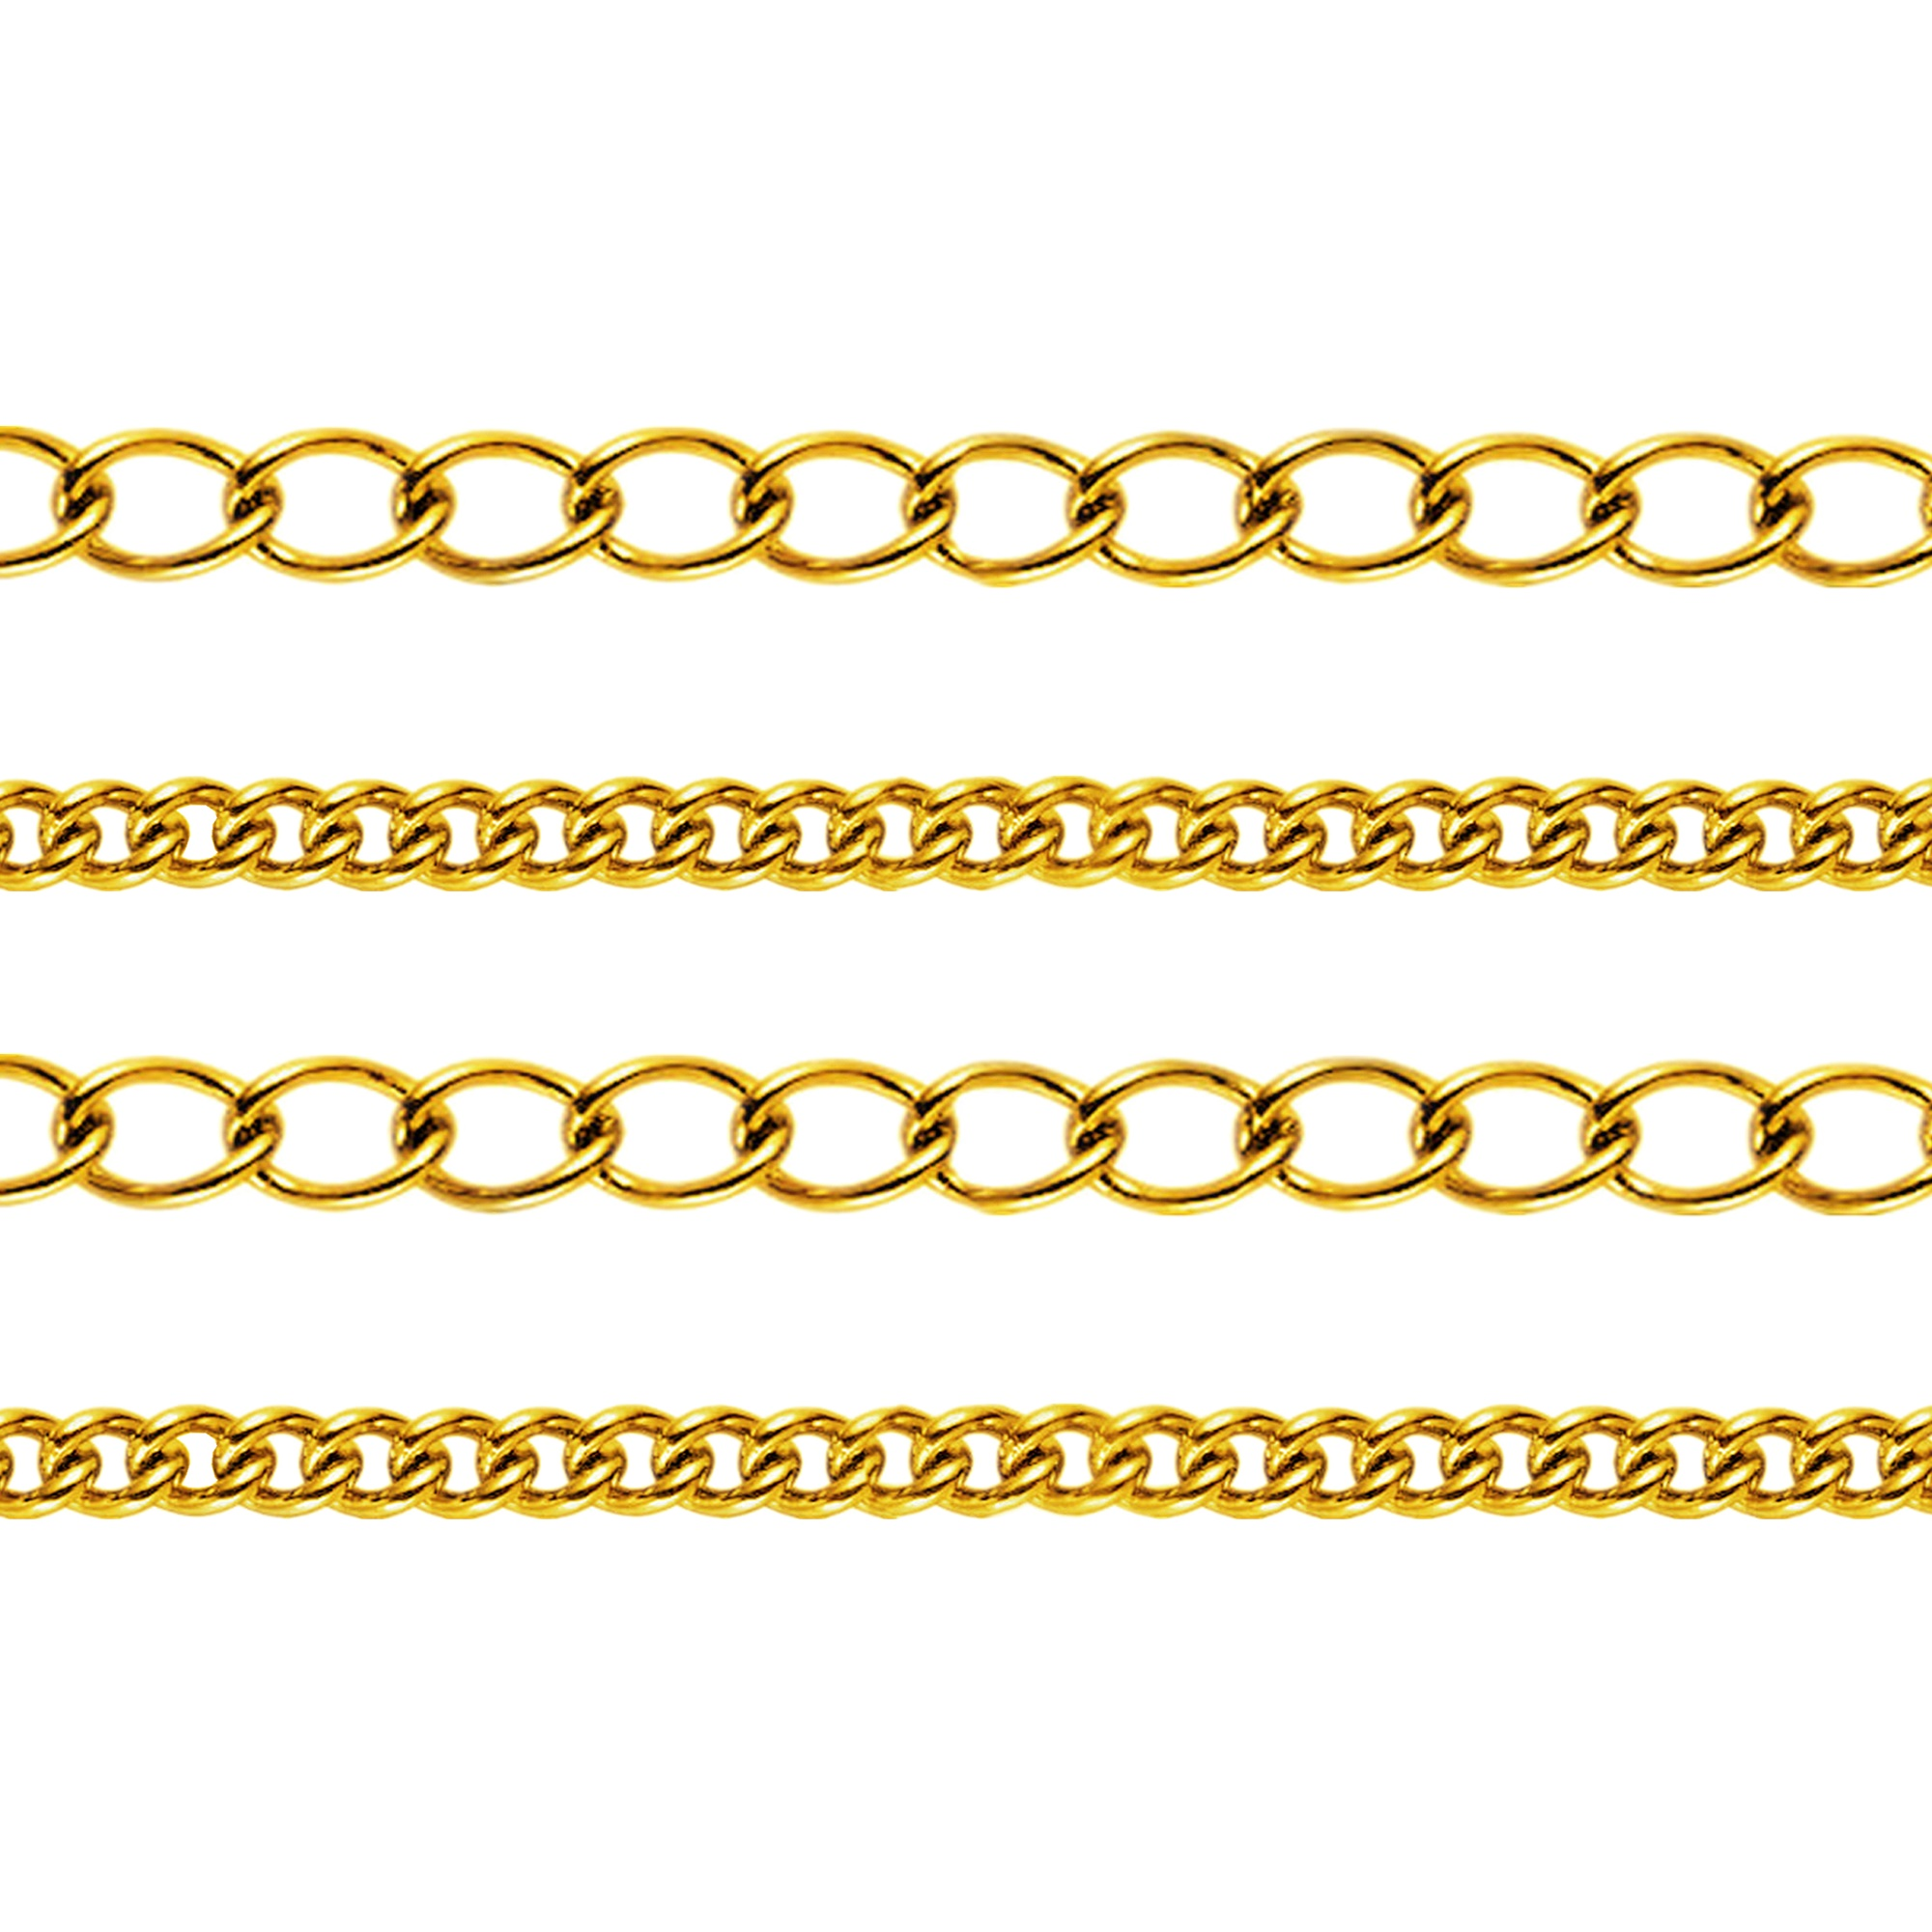 LX1006高速大織鏈機樣品.JPG